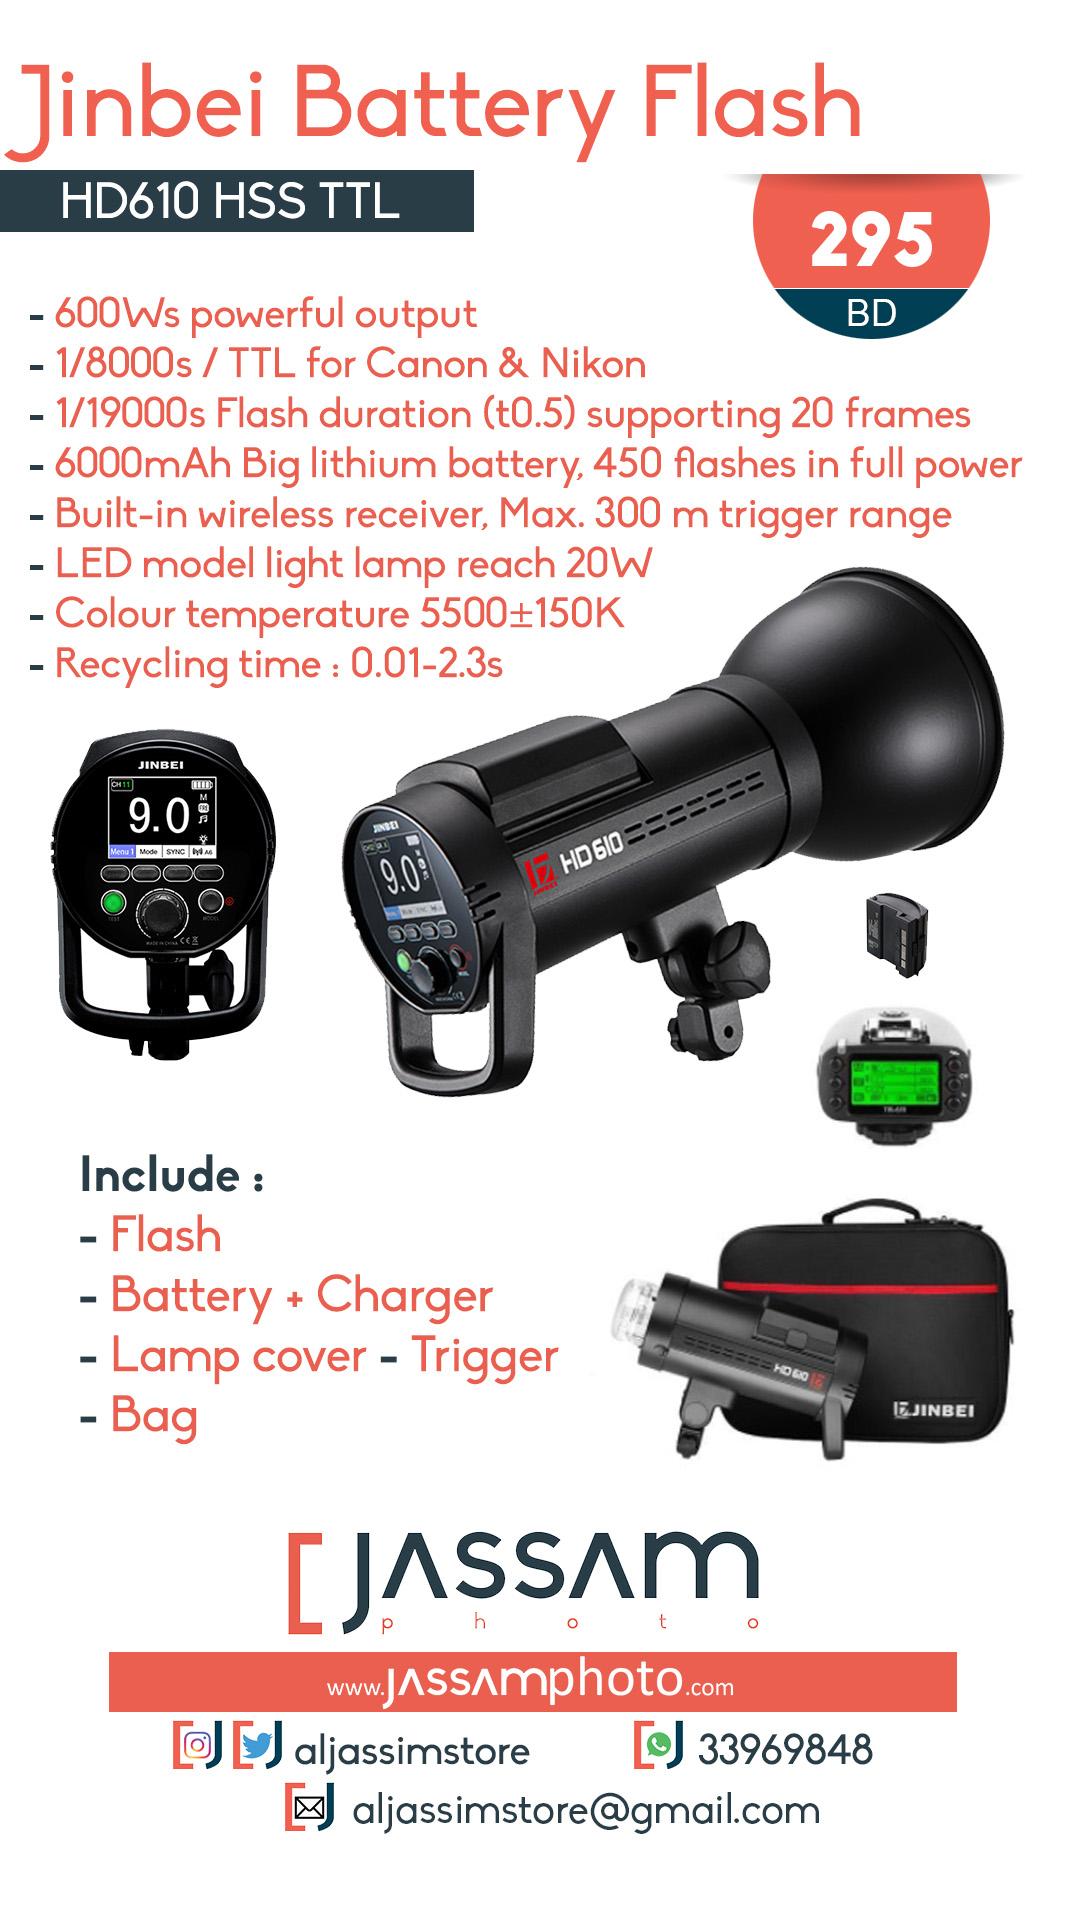 HD-610